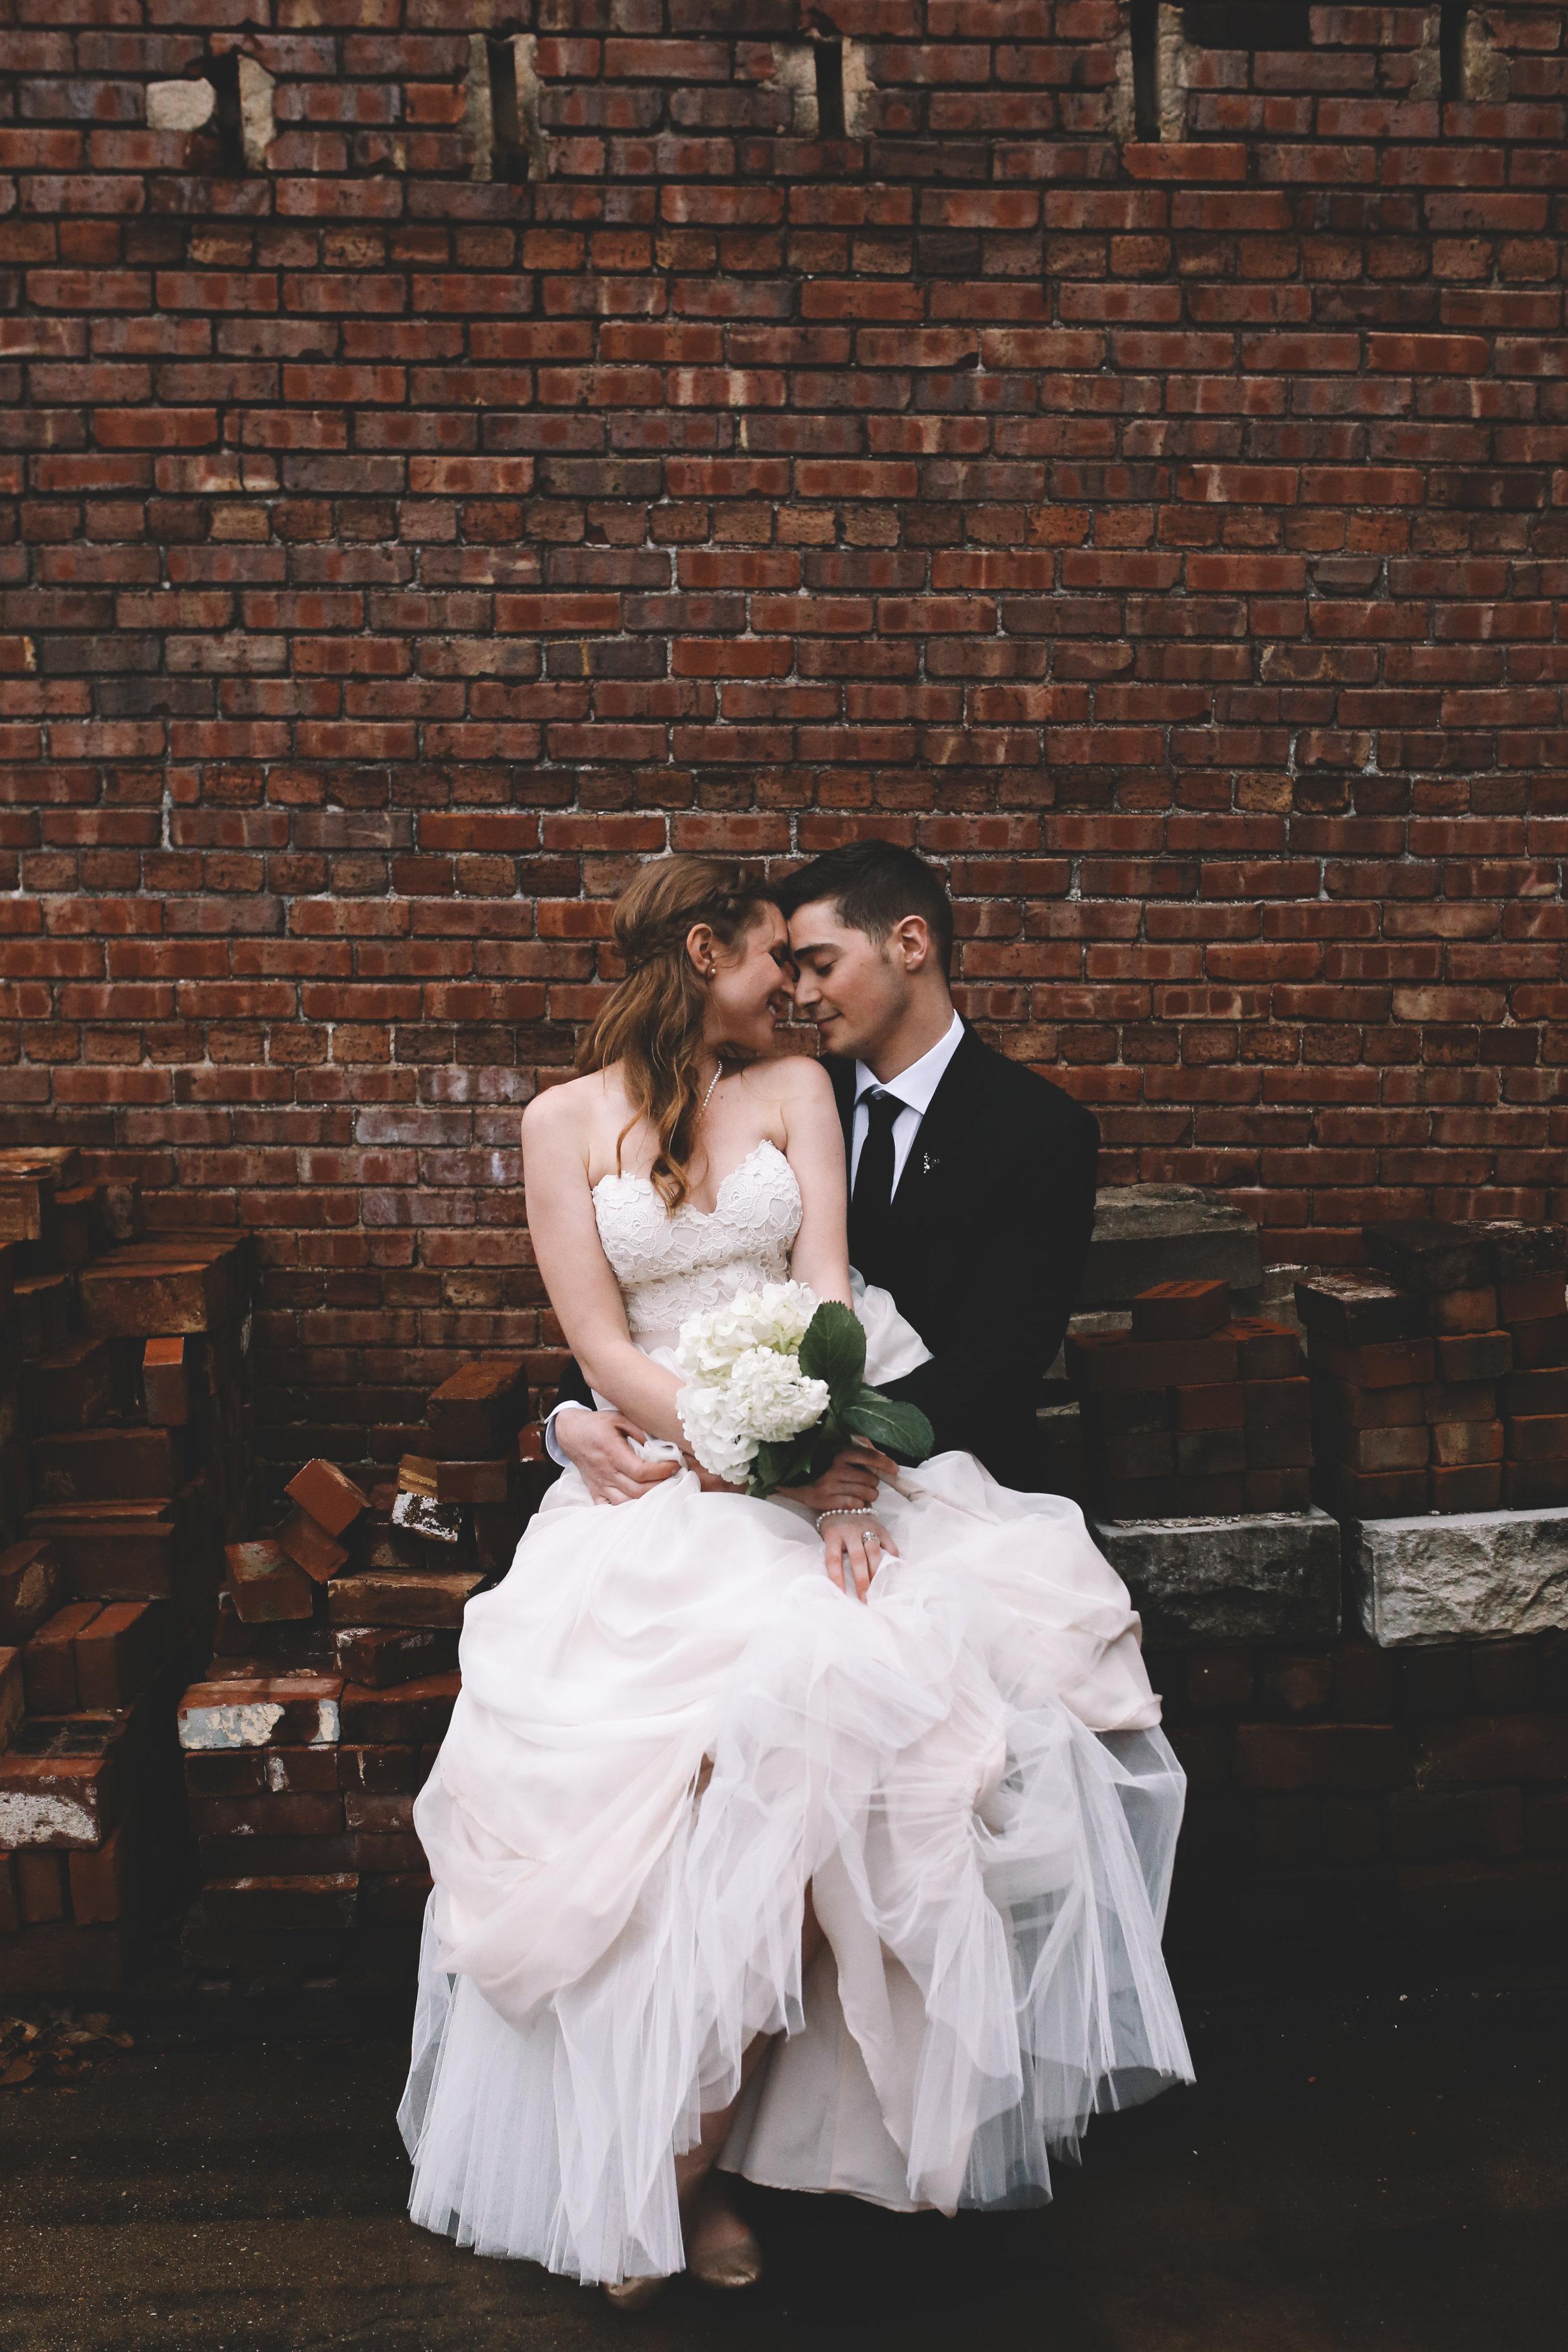 Jake + Brittney Balbas Airbnb Carriage House Wedding Evansville IN (311 of 426).jpg